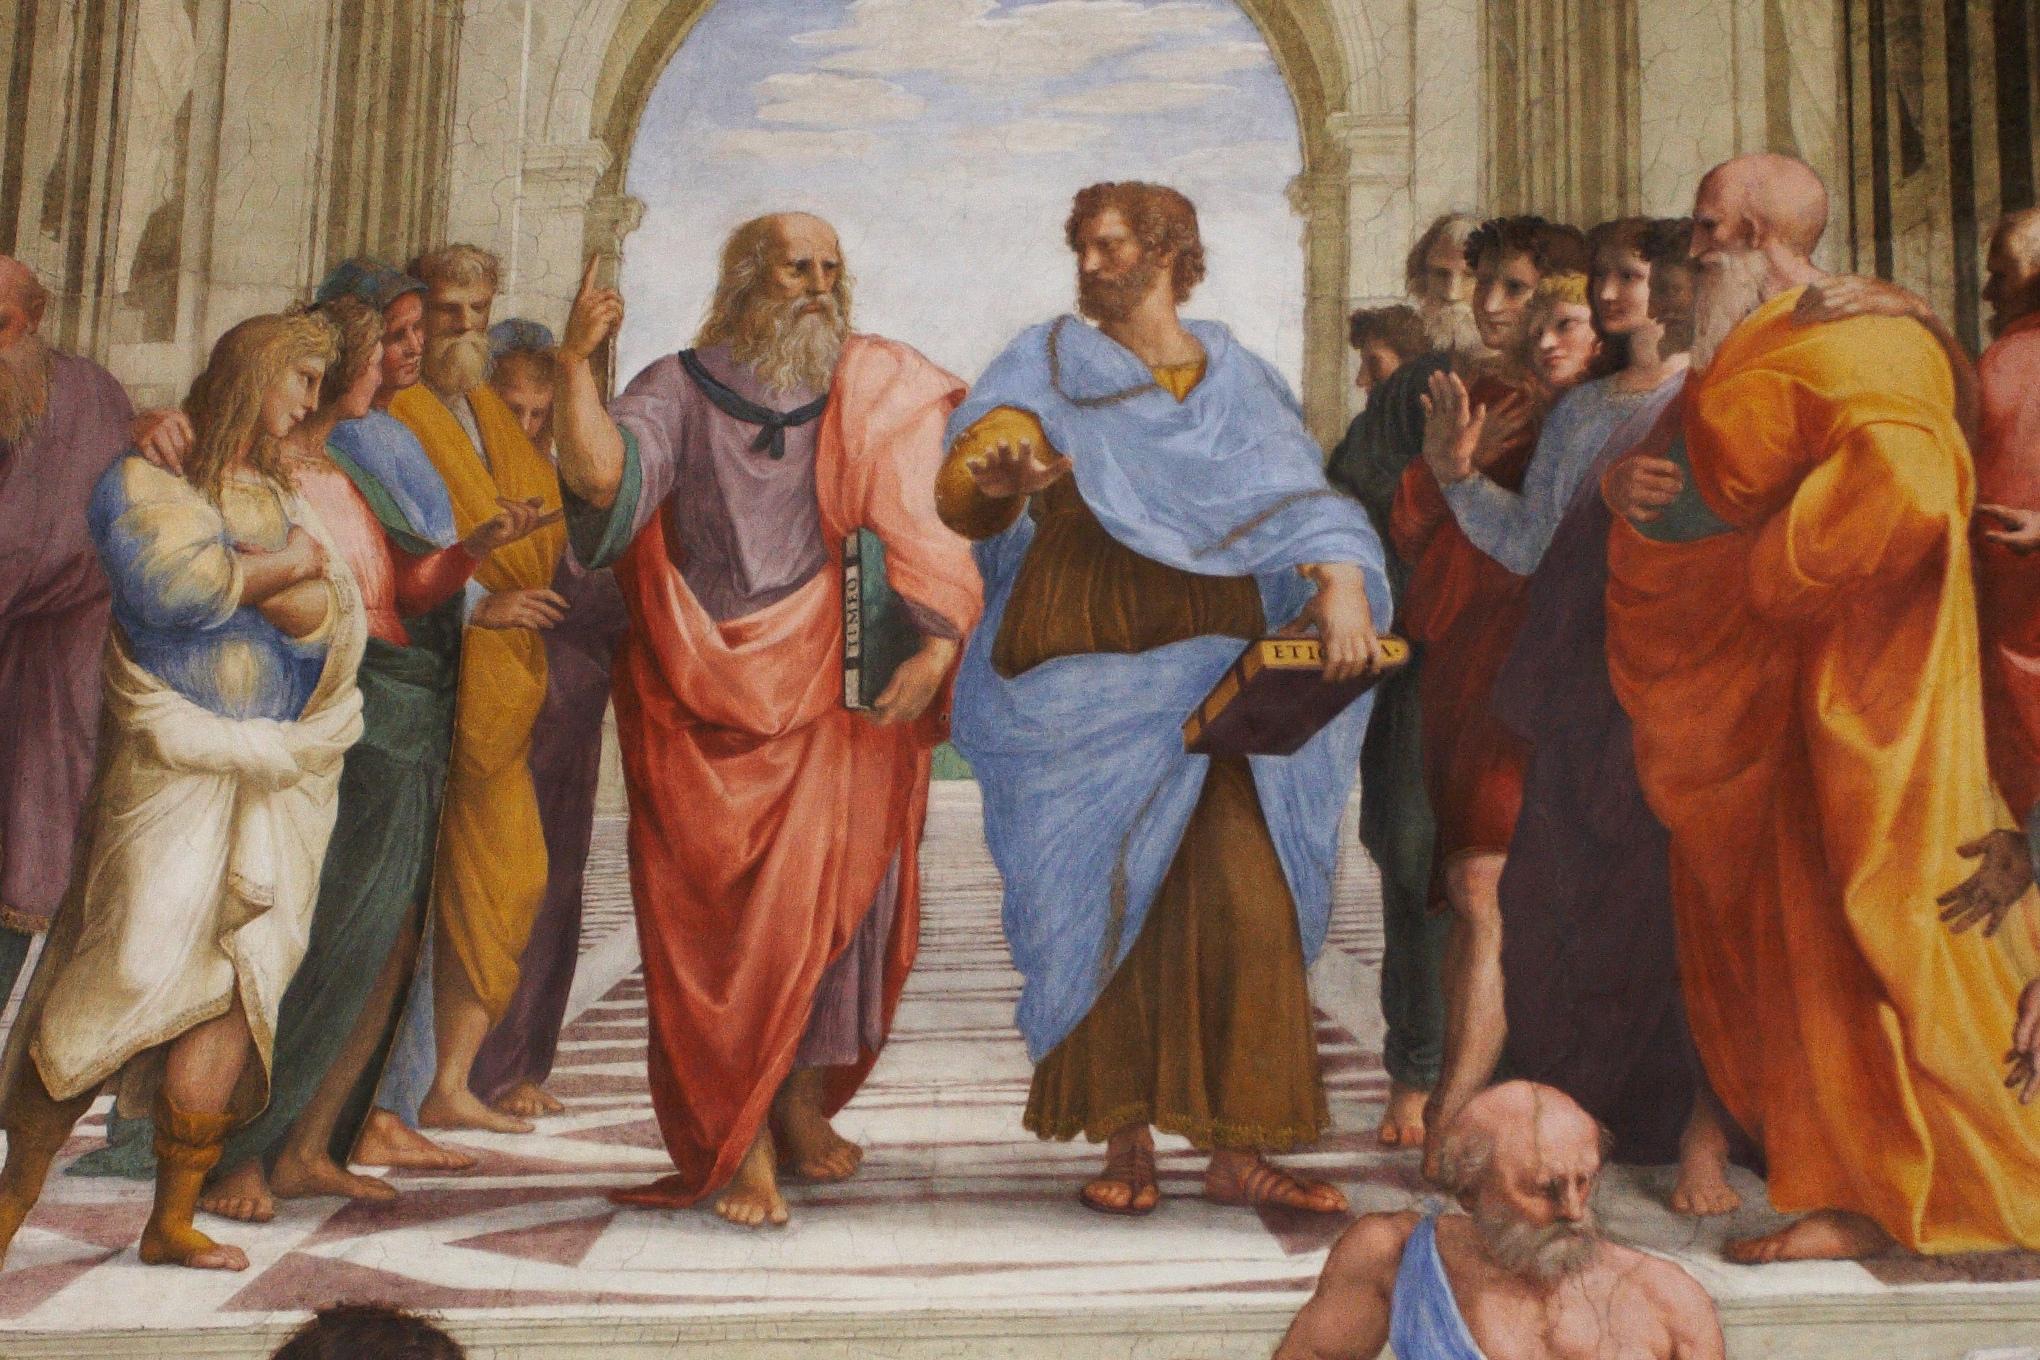 Raphael-Plato-and-Aristotle[1]